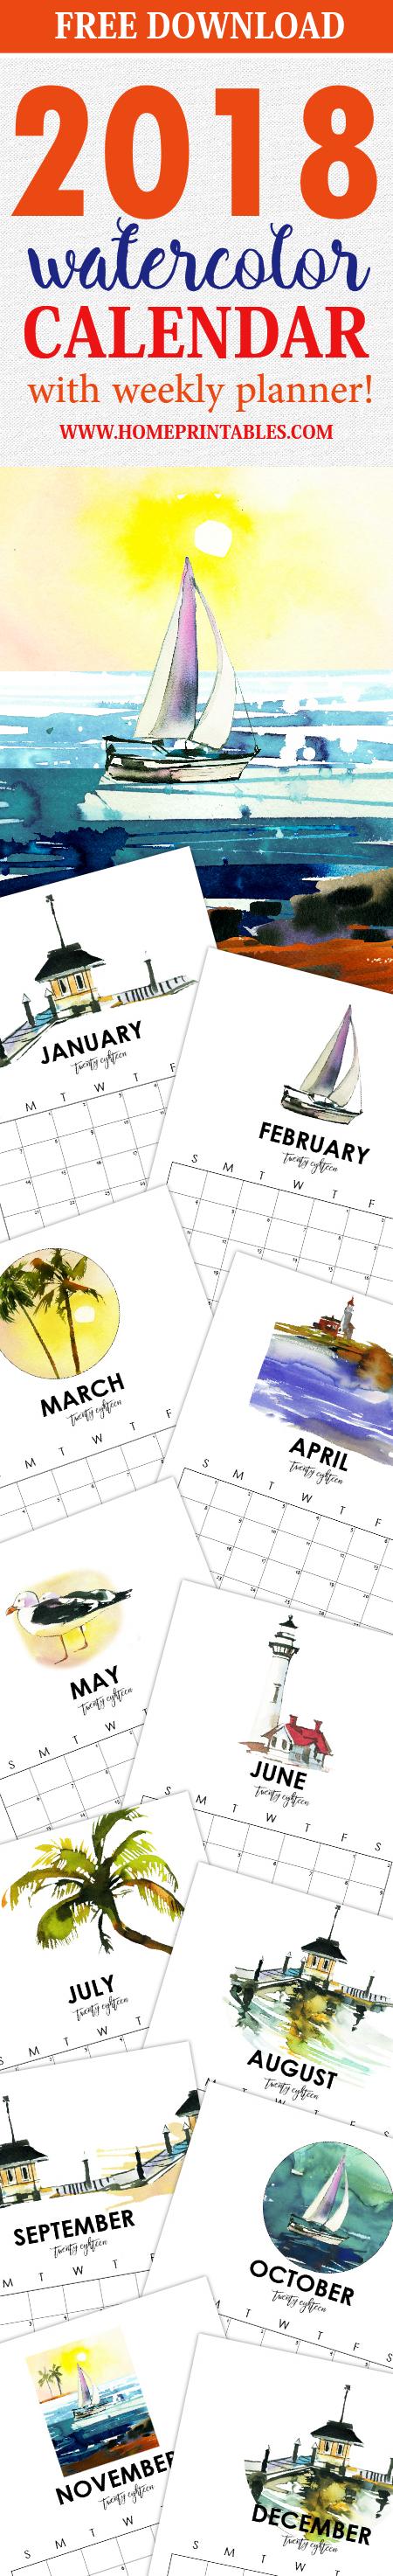 free 2018 calendar planner